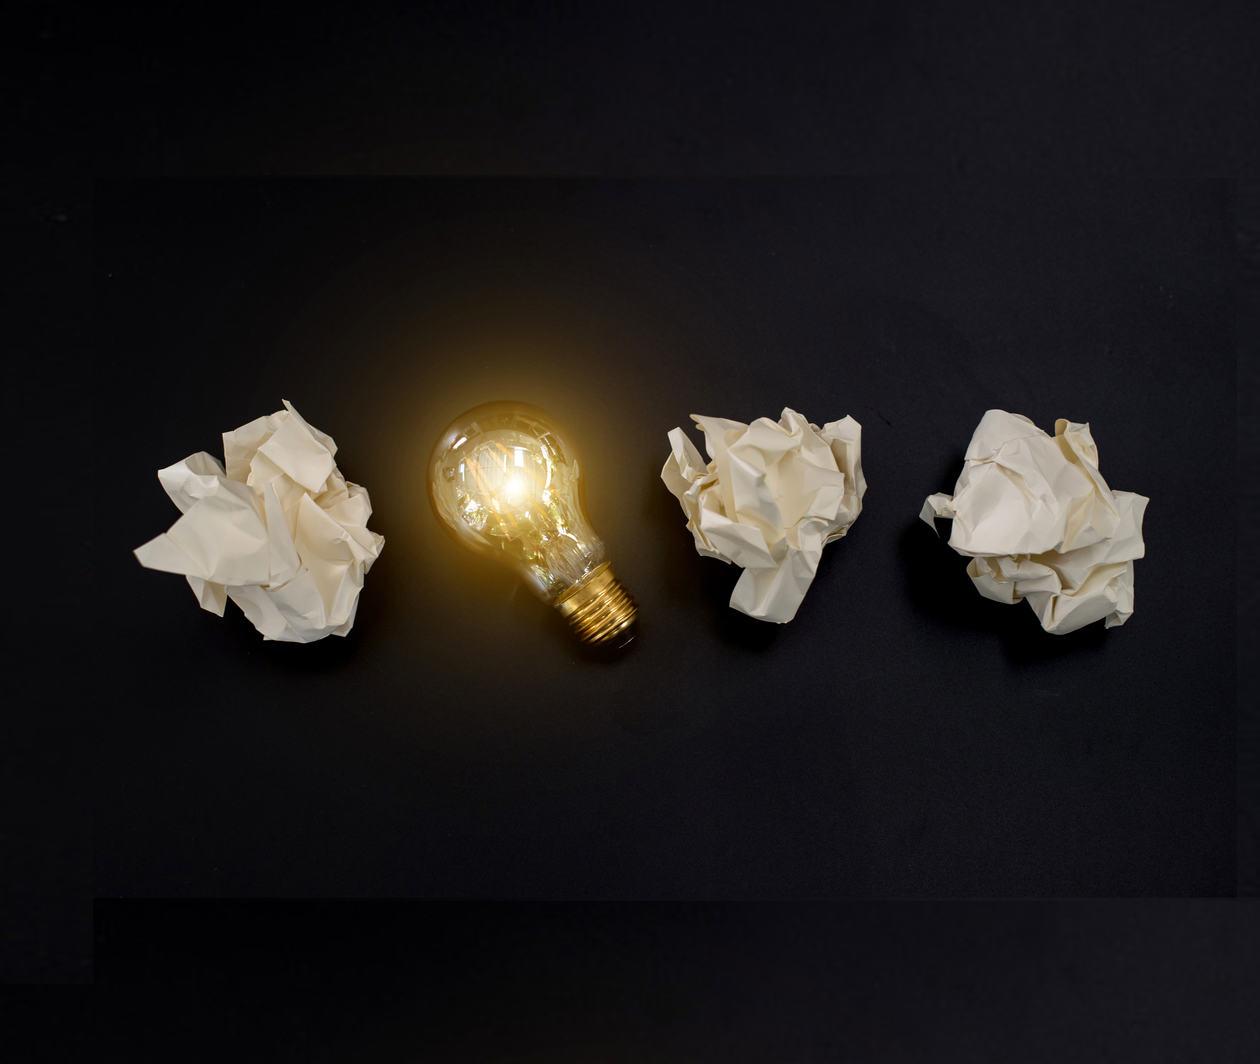 The Future of Innovation and Entrepreneurship